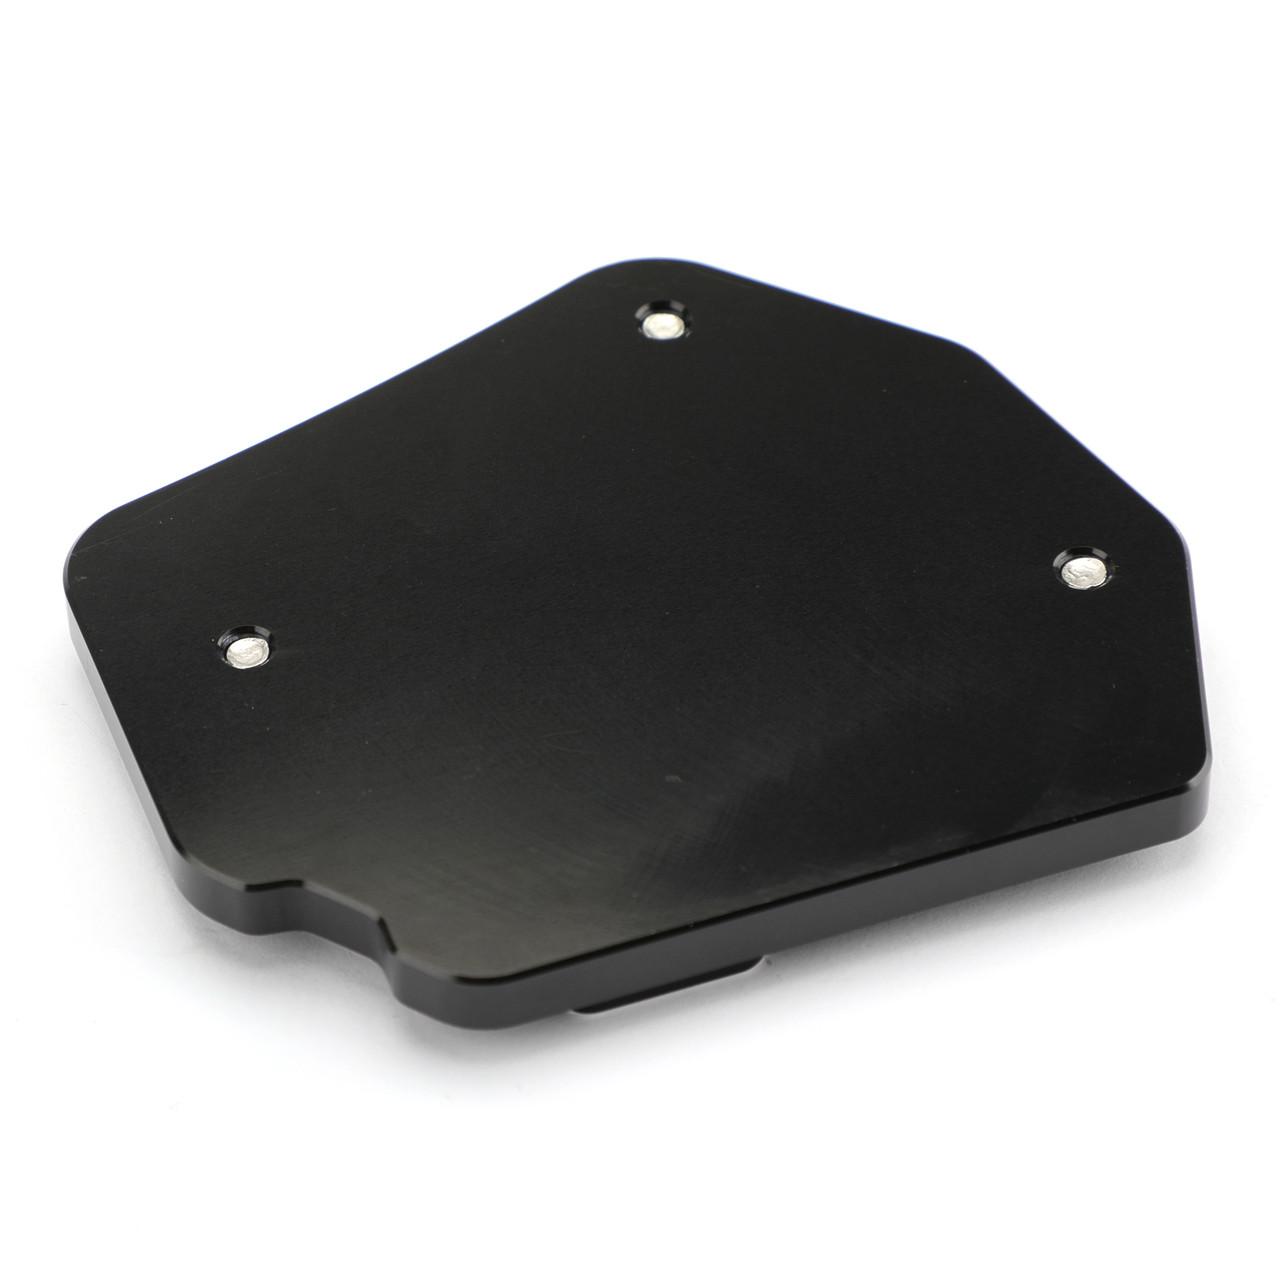 Sidestand Plate Kickstand Extension Pad CNC Aluminium For BMW F800GS 08-16 Black